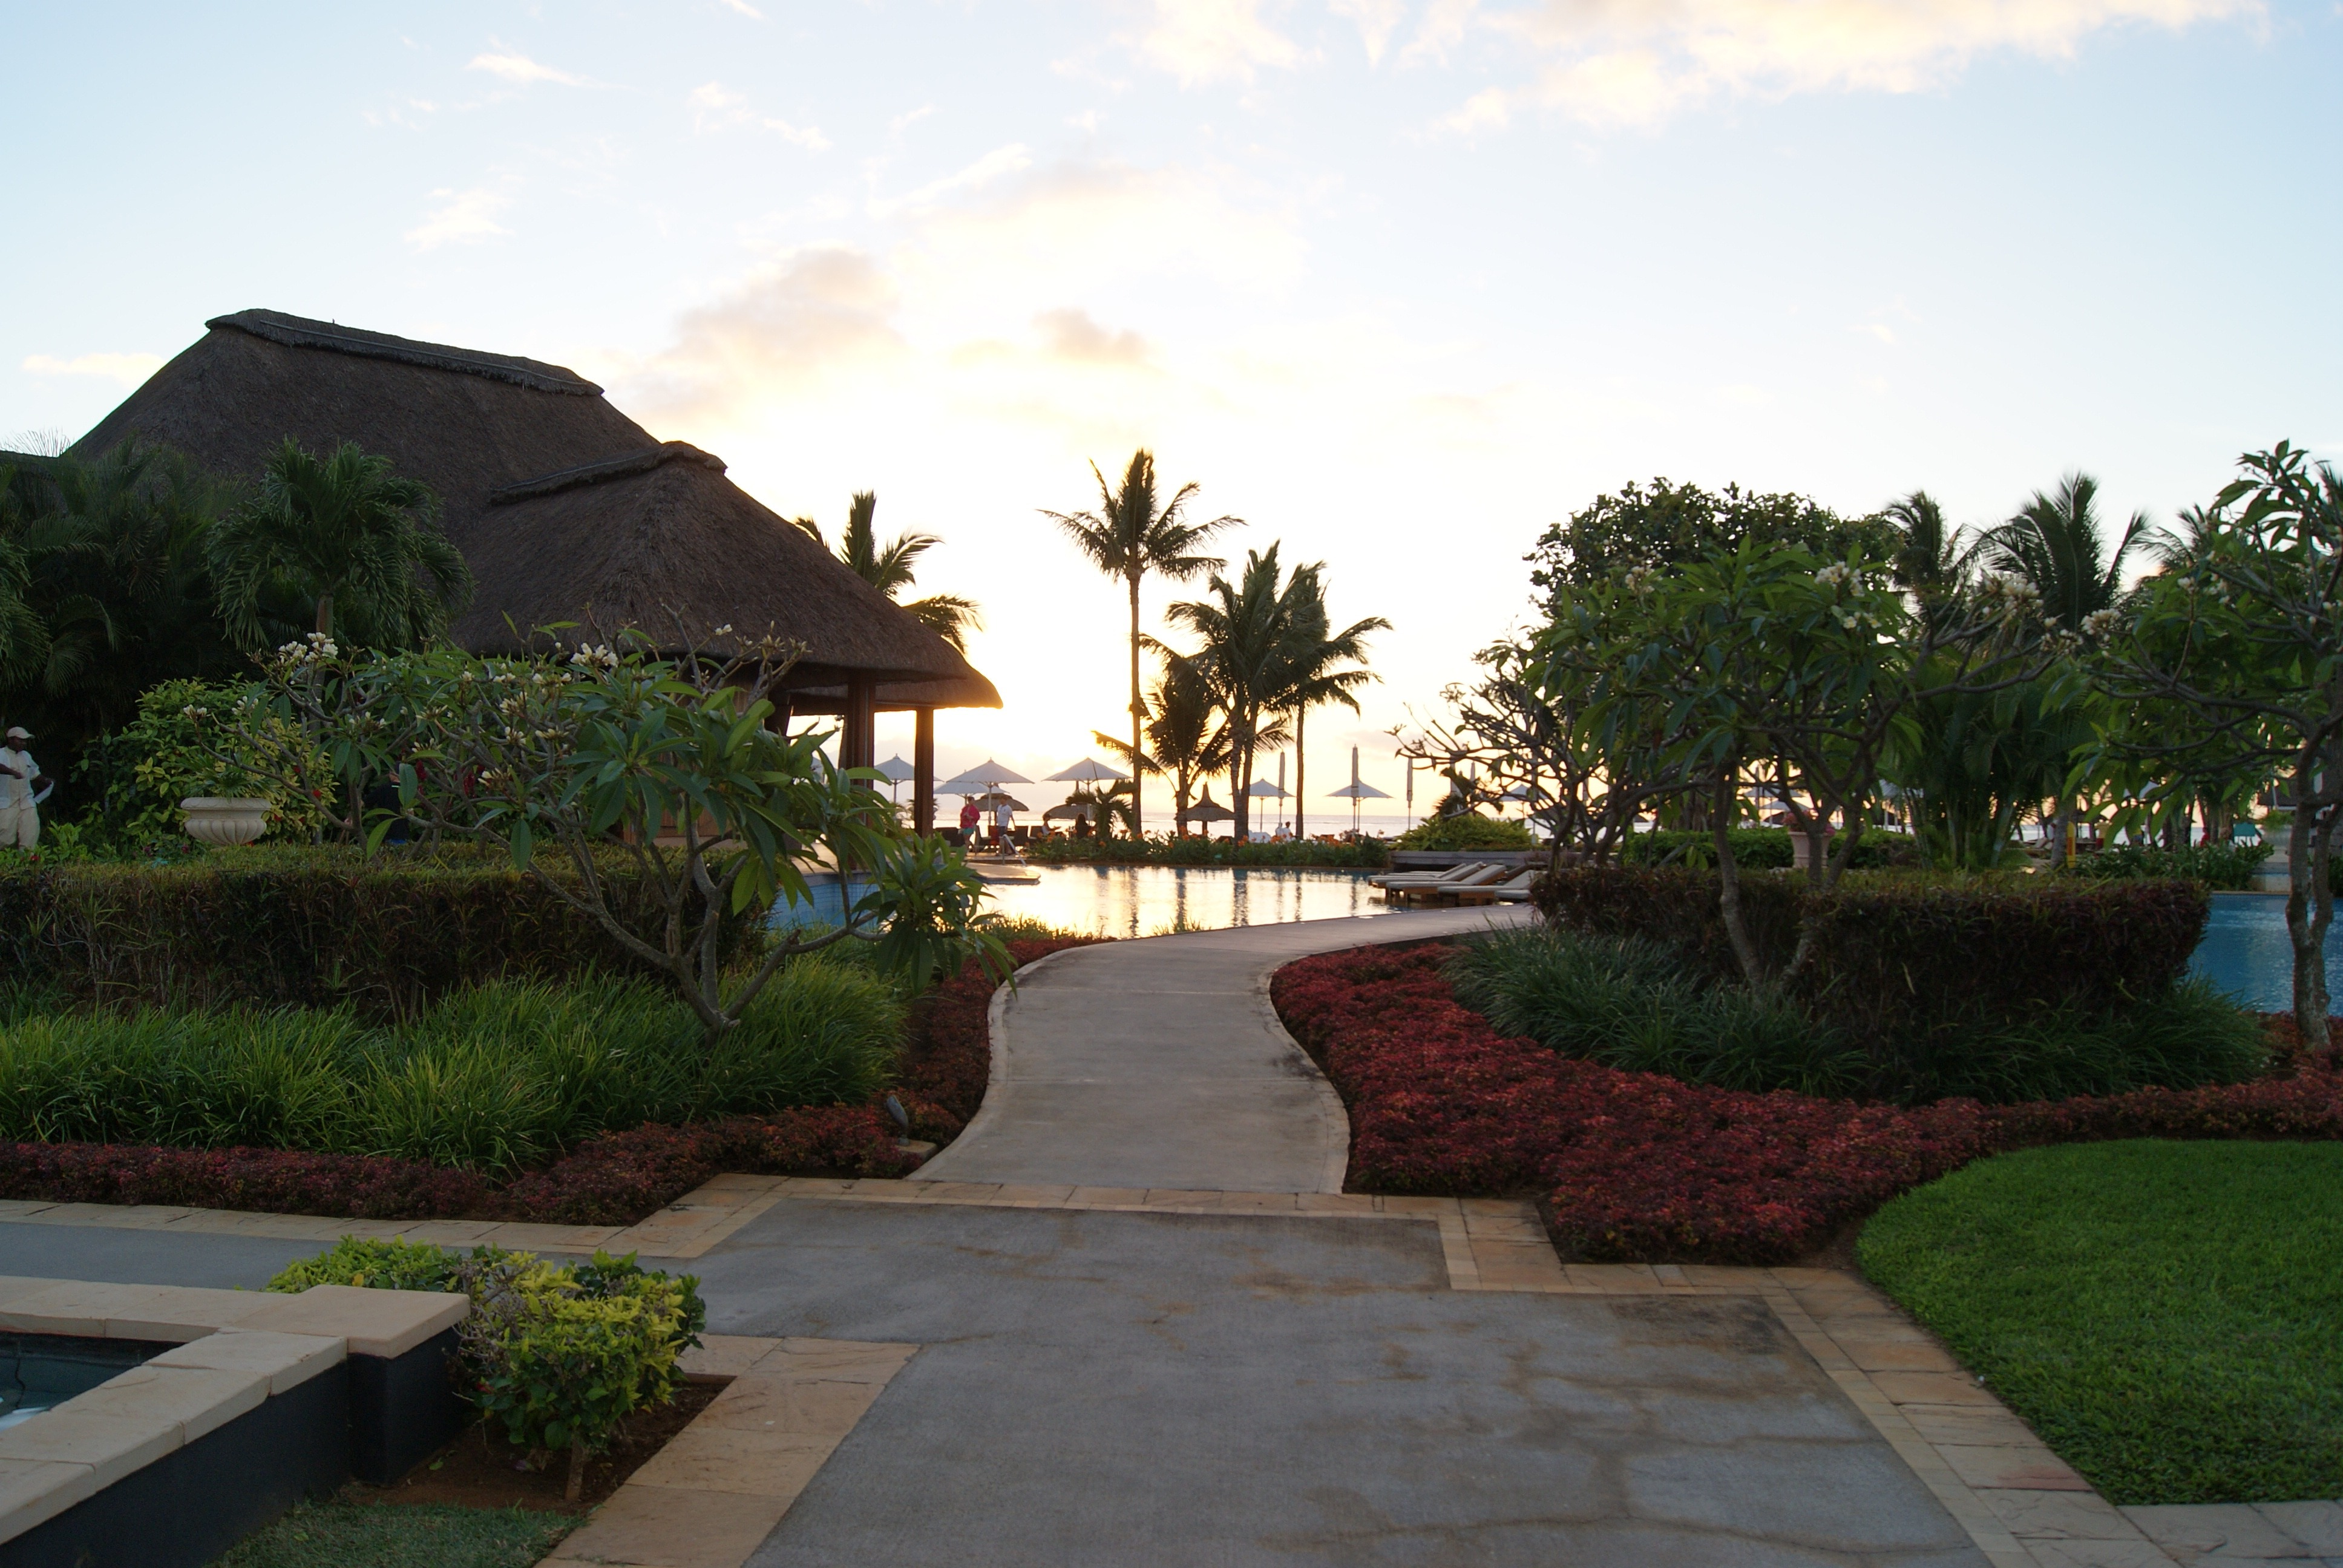 Garden pool relaxation free image for Garden pool pdf